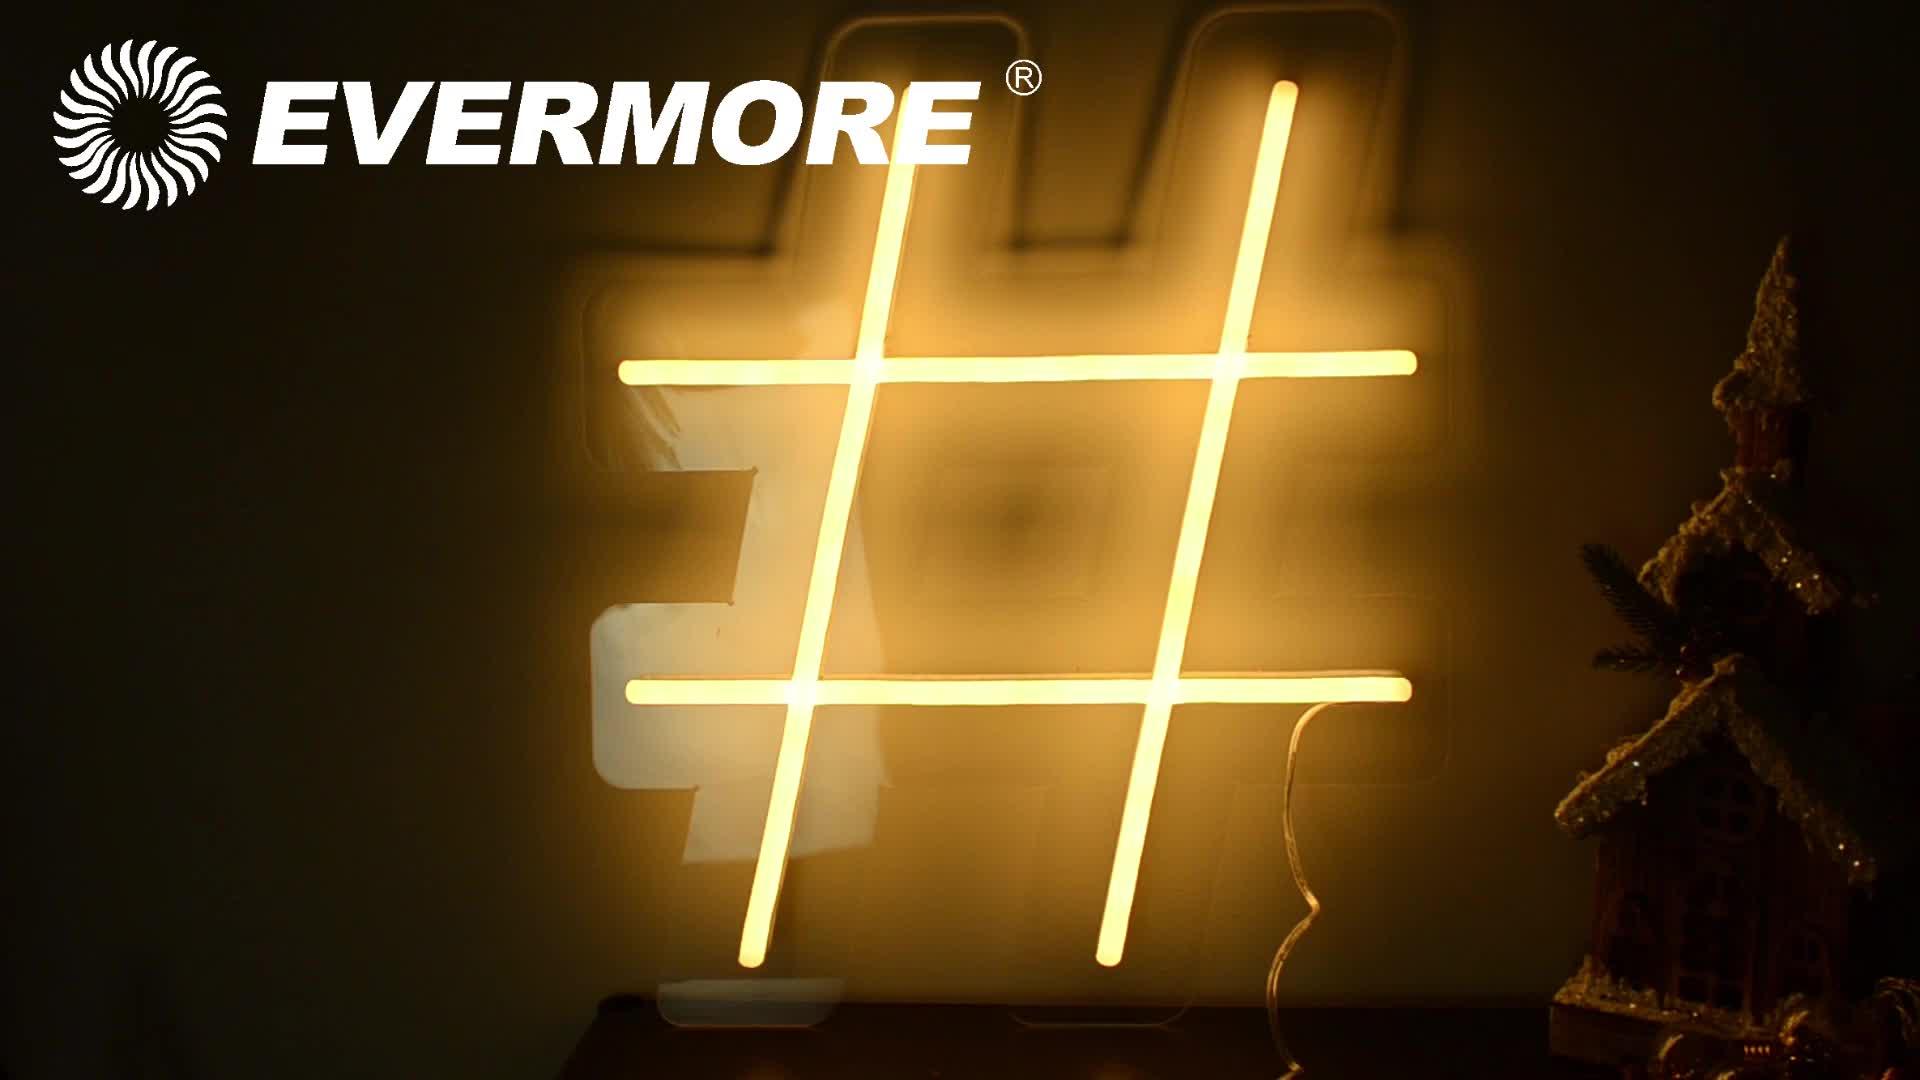 Preço barato home bar cor de negócios logotipo letras palavras vivas flexível aberto sinal de néon de vidro